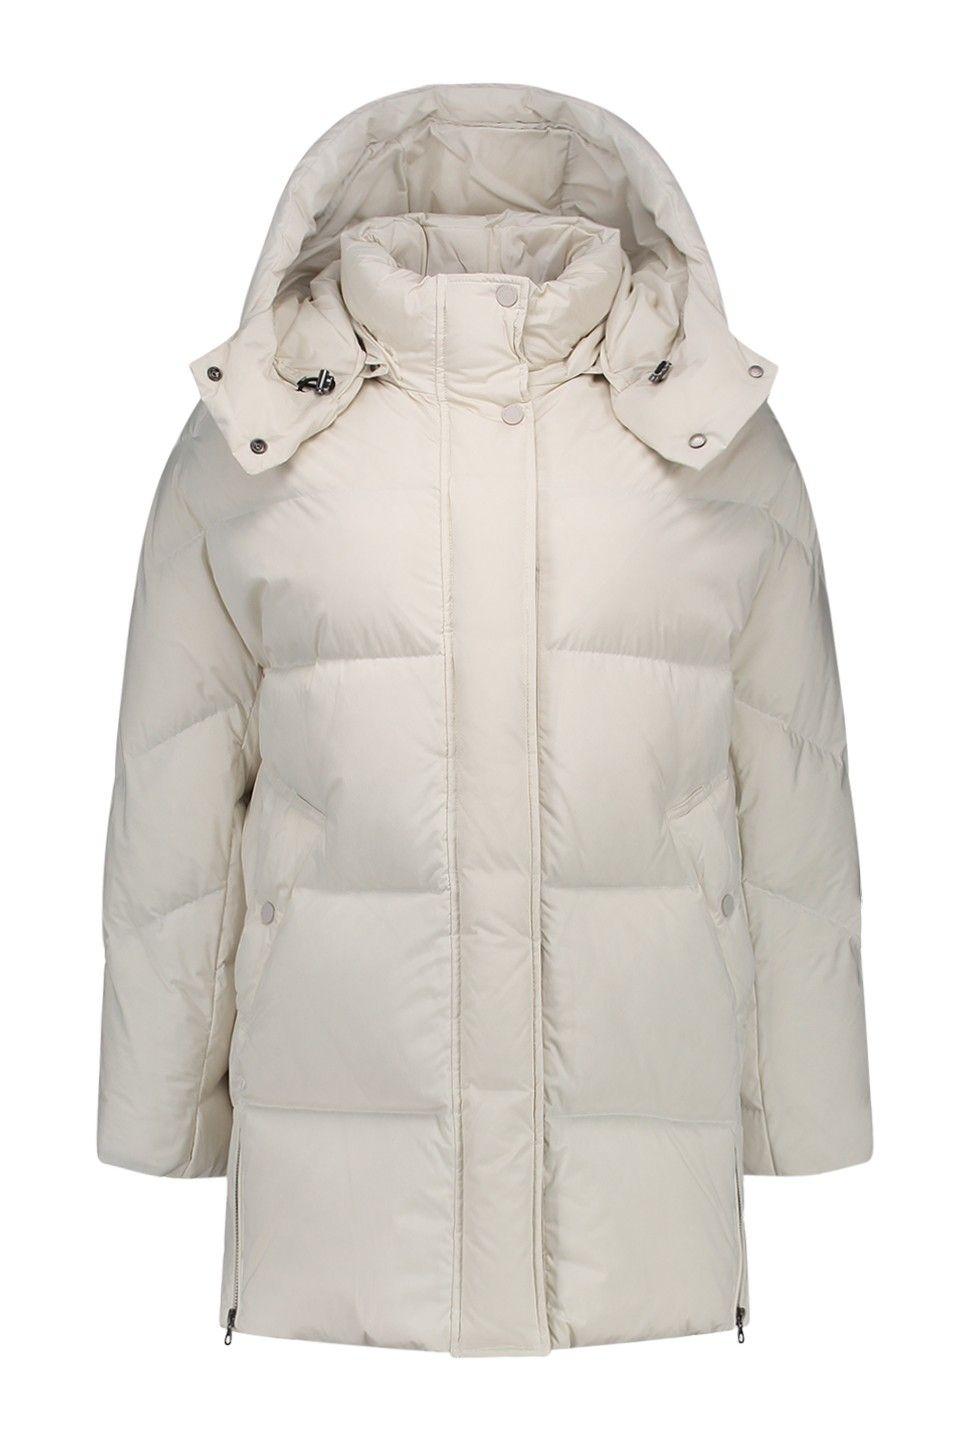 Winterjas Merken 2019.Woolrich Aurora Puffy Coat Wwcps2599 Pd40 White Igloo Merken Bloom